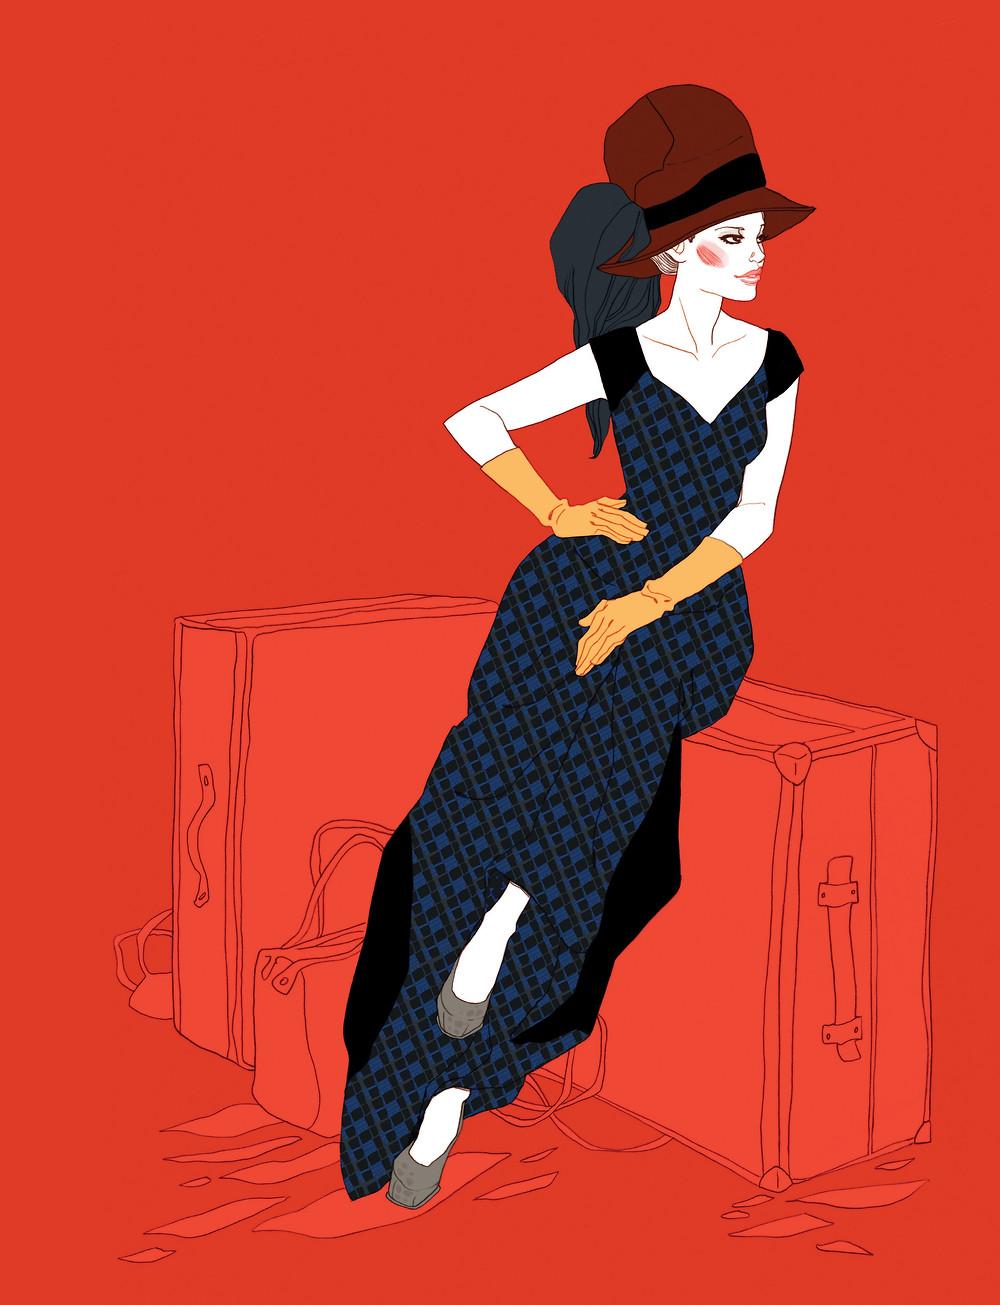 Louis Vuitton collection - illustration for Common&Sense magazine, Japan.